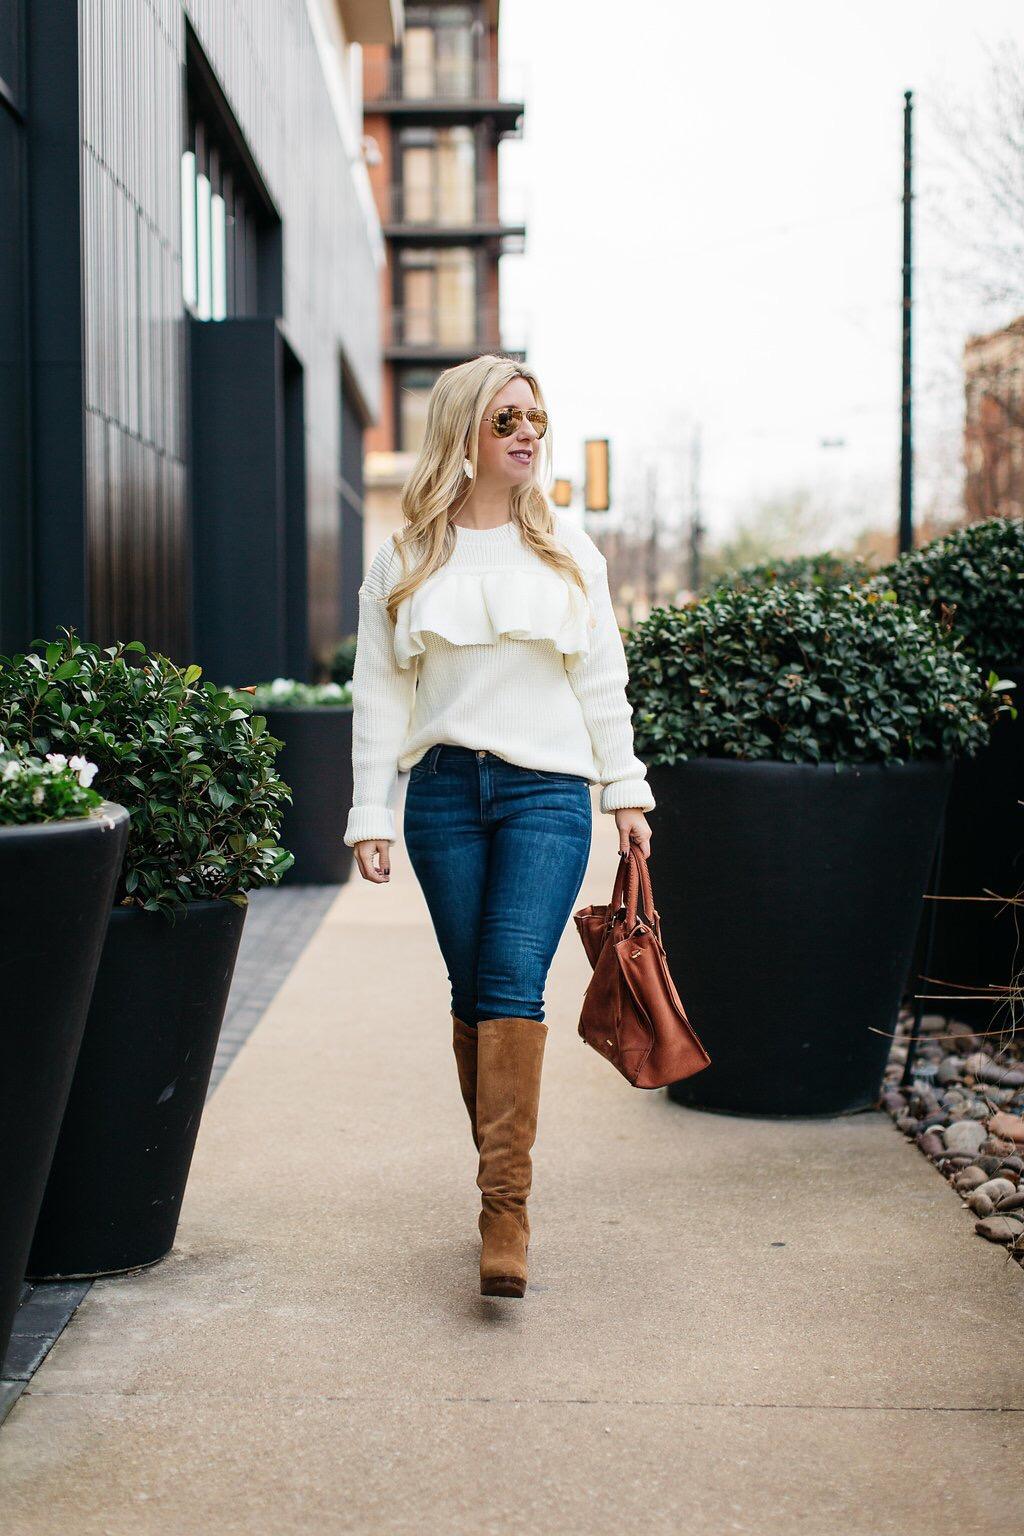 Chunky knit sweater | Dallas Fashion | Nicole Kirk